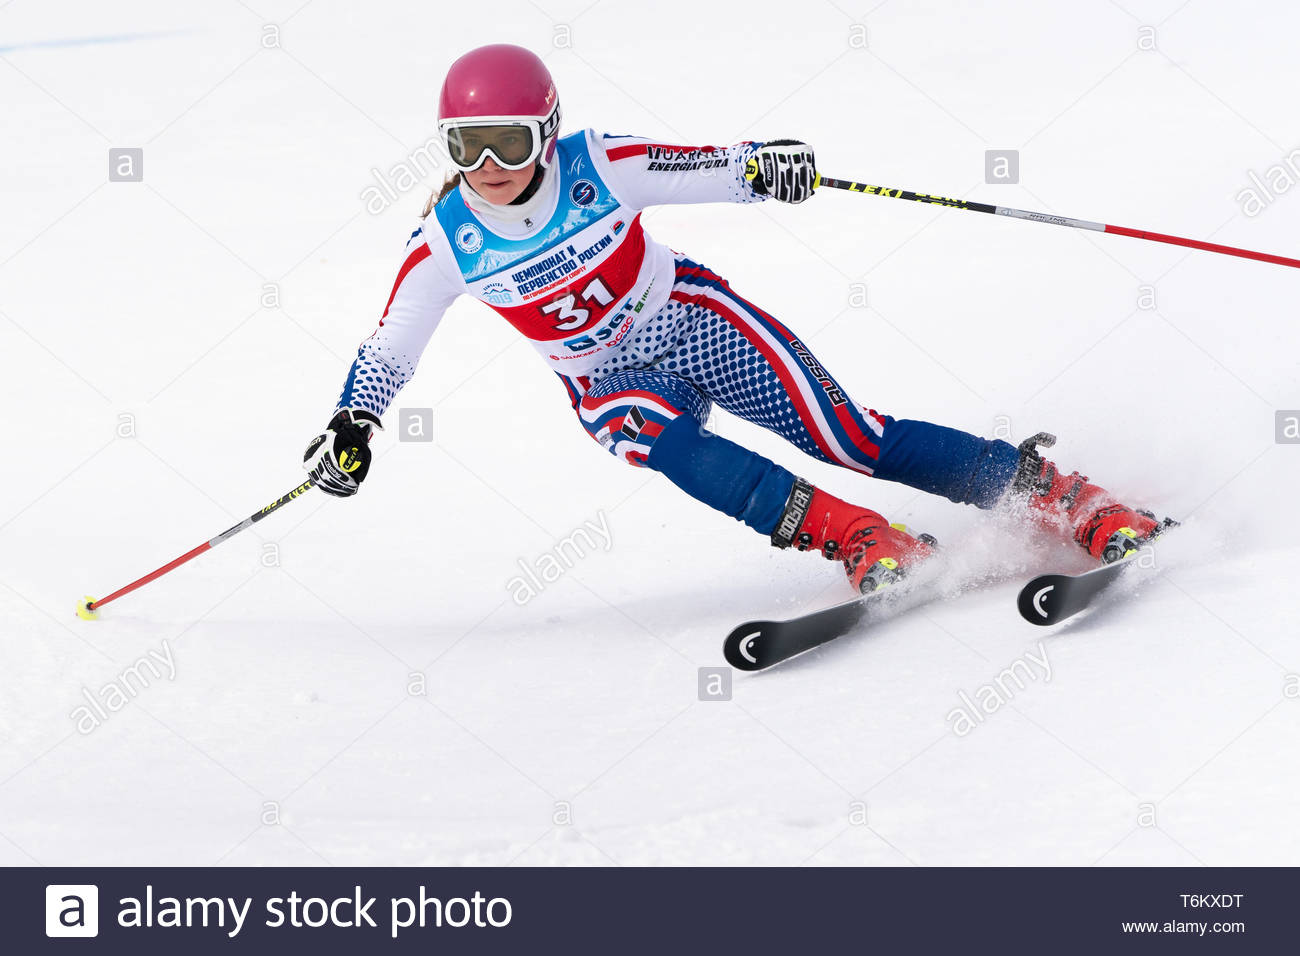 KAMCHATKA PENINSULA, RUSSIA - APR 2, 2019: Mountain skier Kryukova Darya (Chelyabinsk) skiing down mount slope. Russian Women's Alpine Skiing Cup Inte - Stock Image